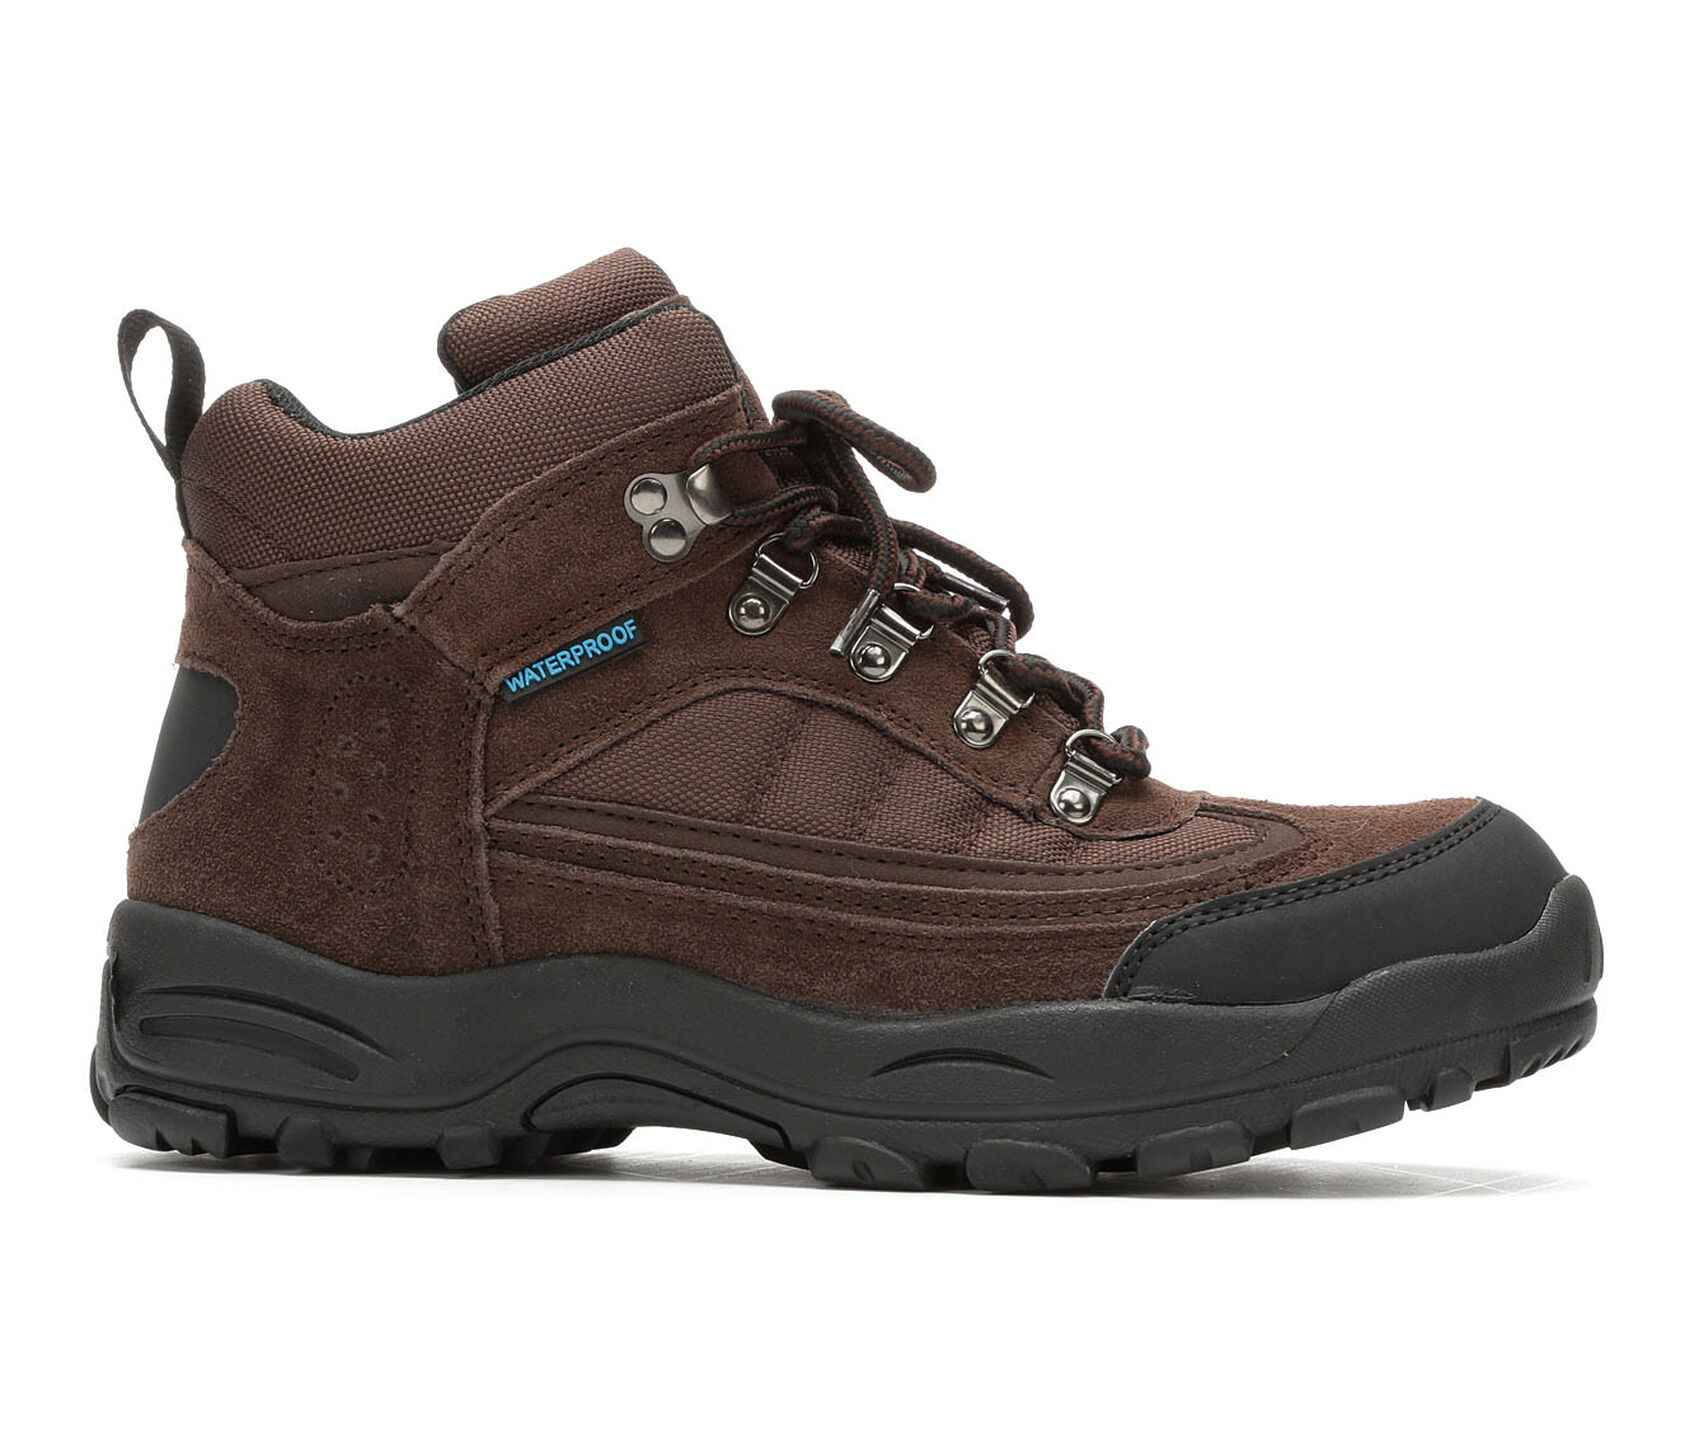 929f96fea783a2 Men's Itasca Sonoma Brazil Hiking Boots   Shoe Carnival